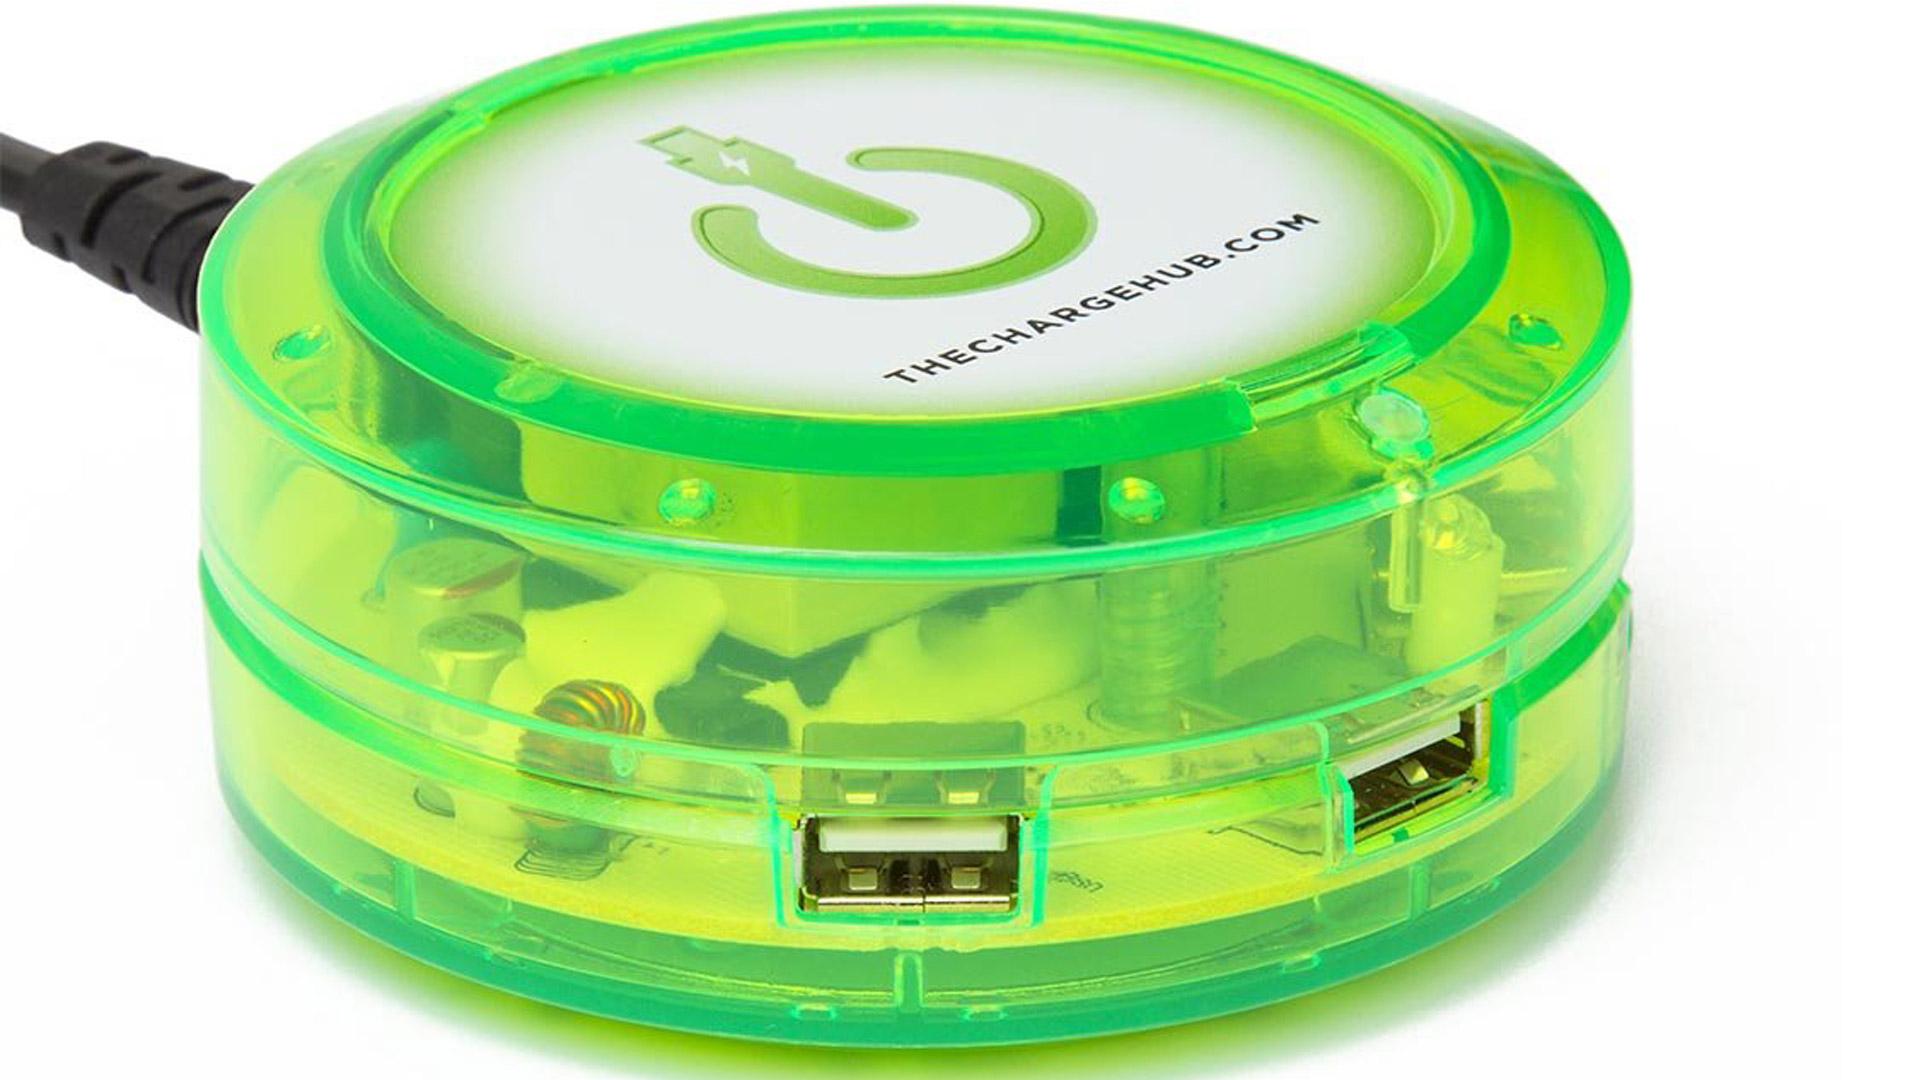 ChargeHub X3 USB Charging Station